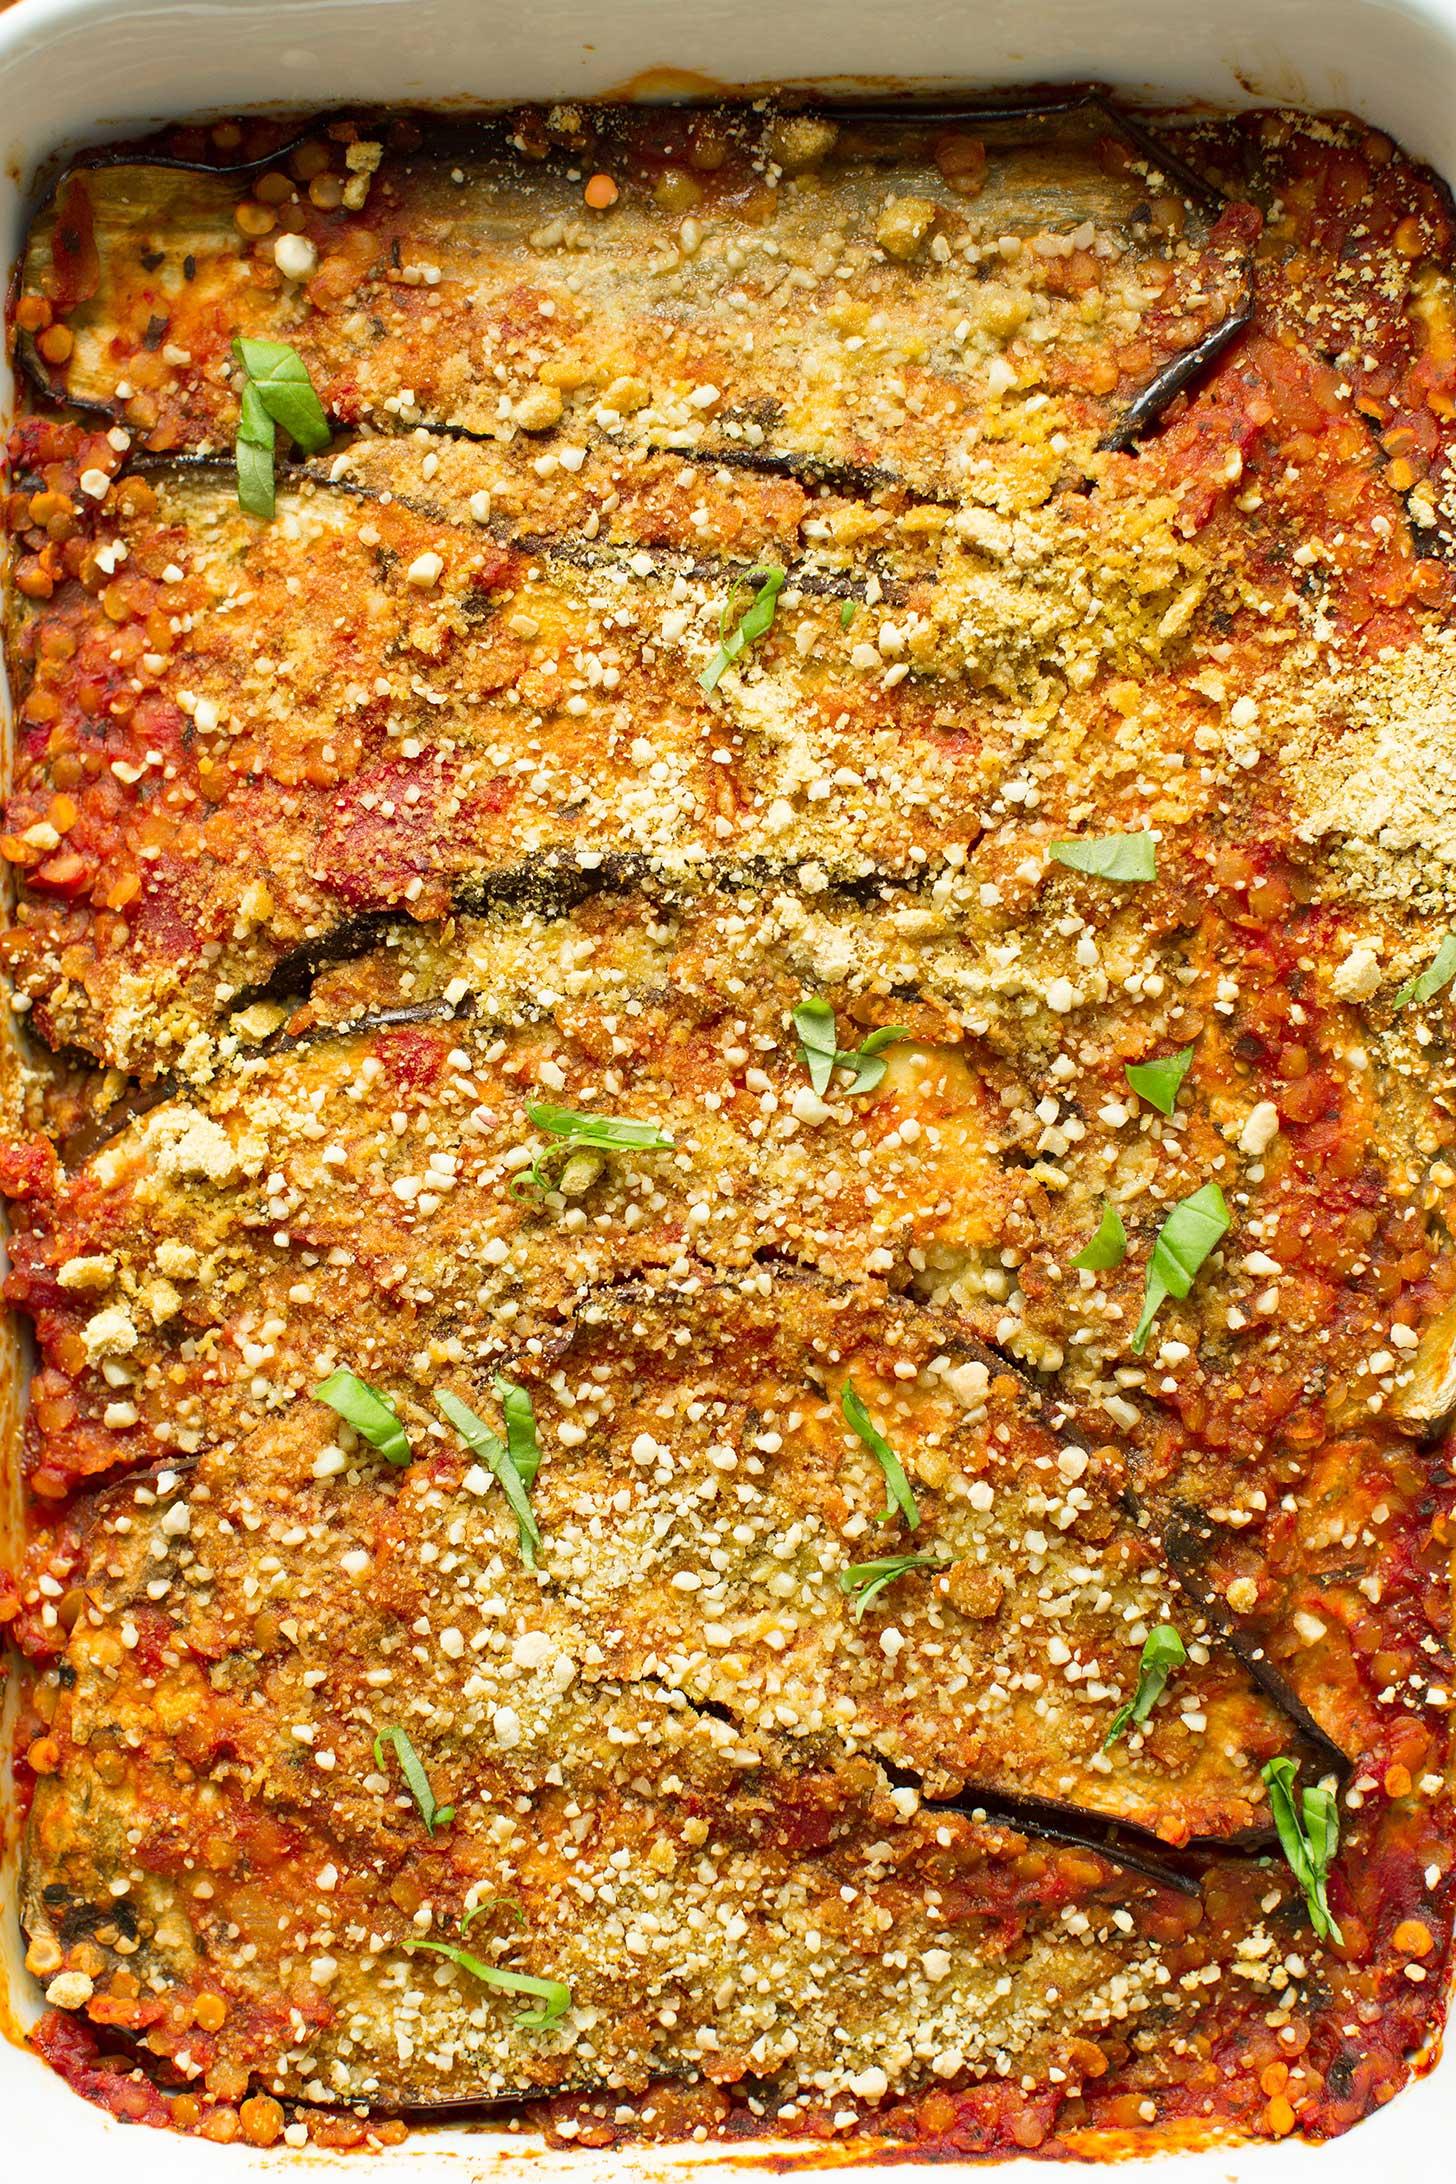 Freshly baked gluten-free vegan Eggplant Lasagna with Lentil Red Sauce